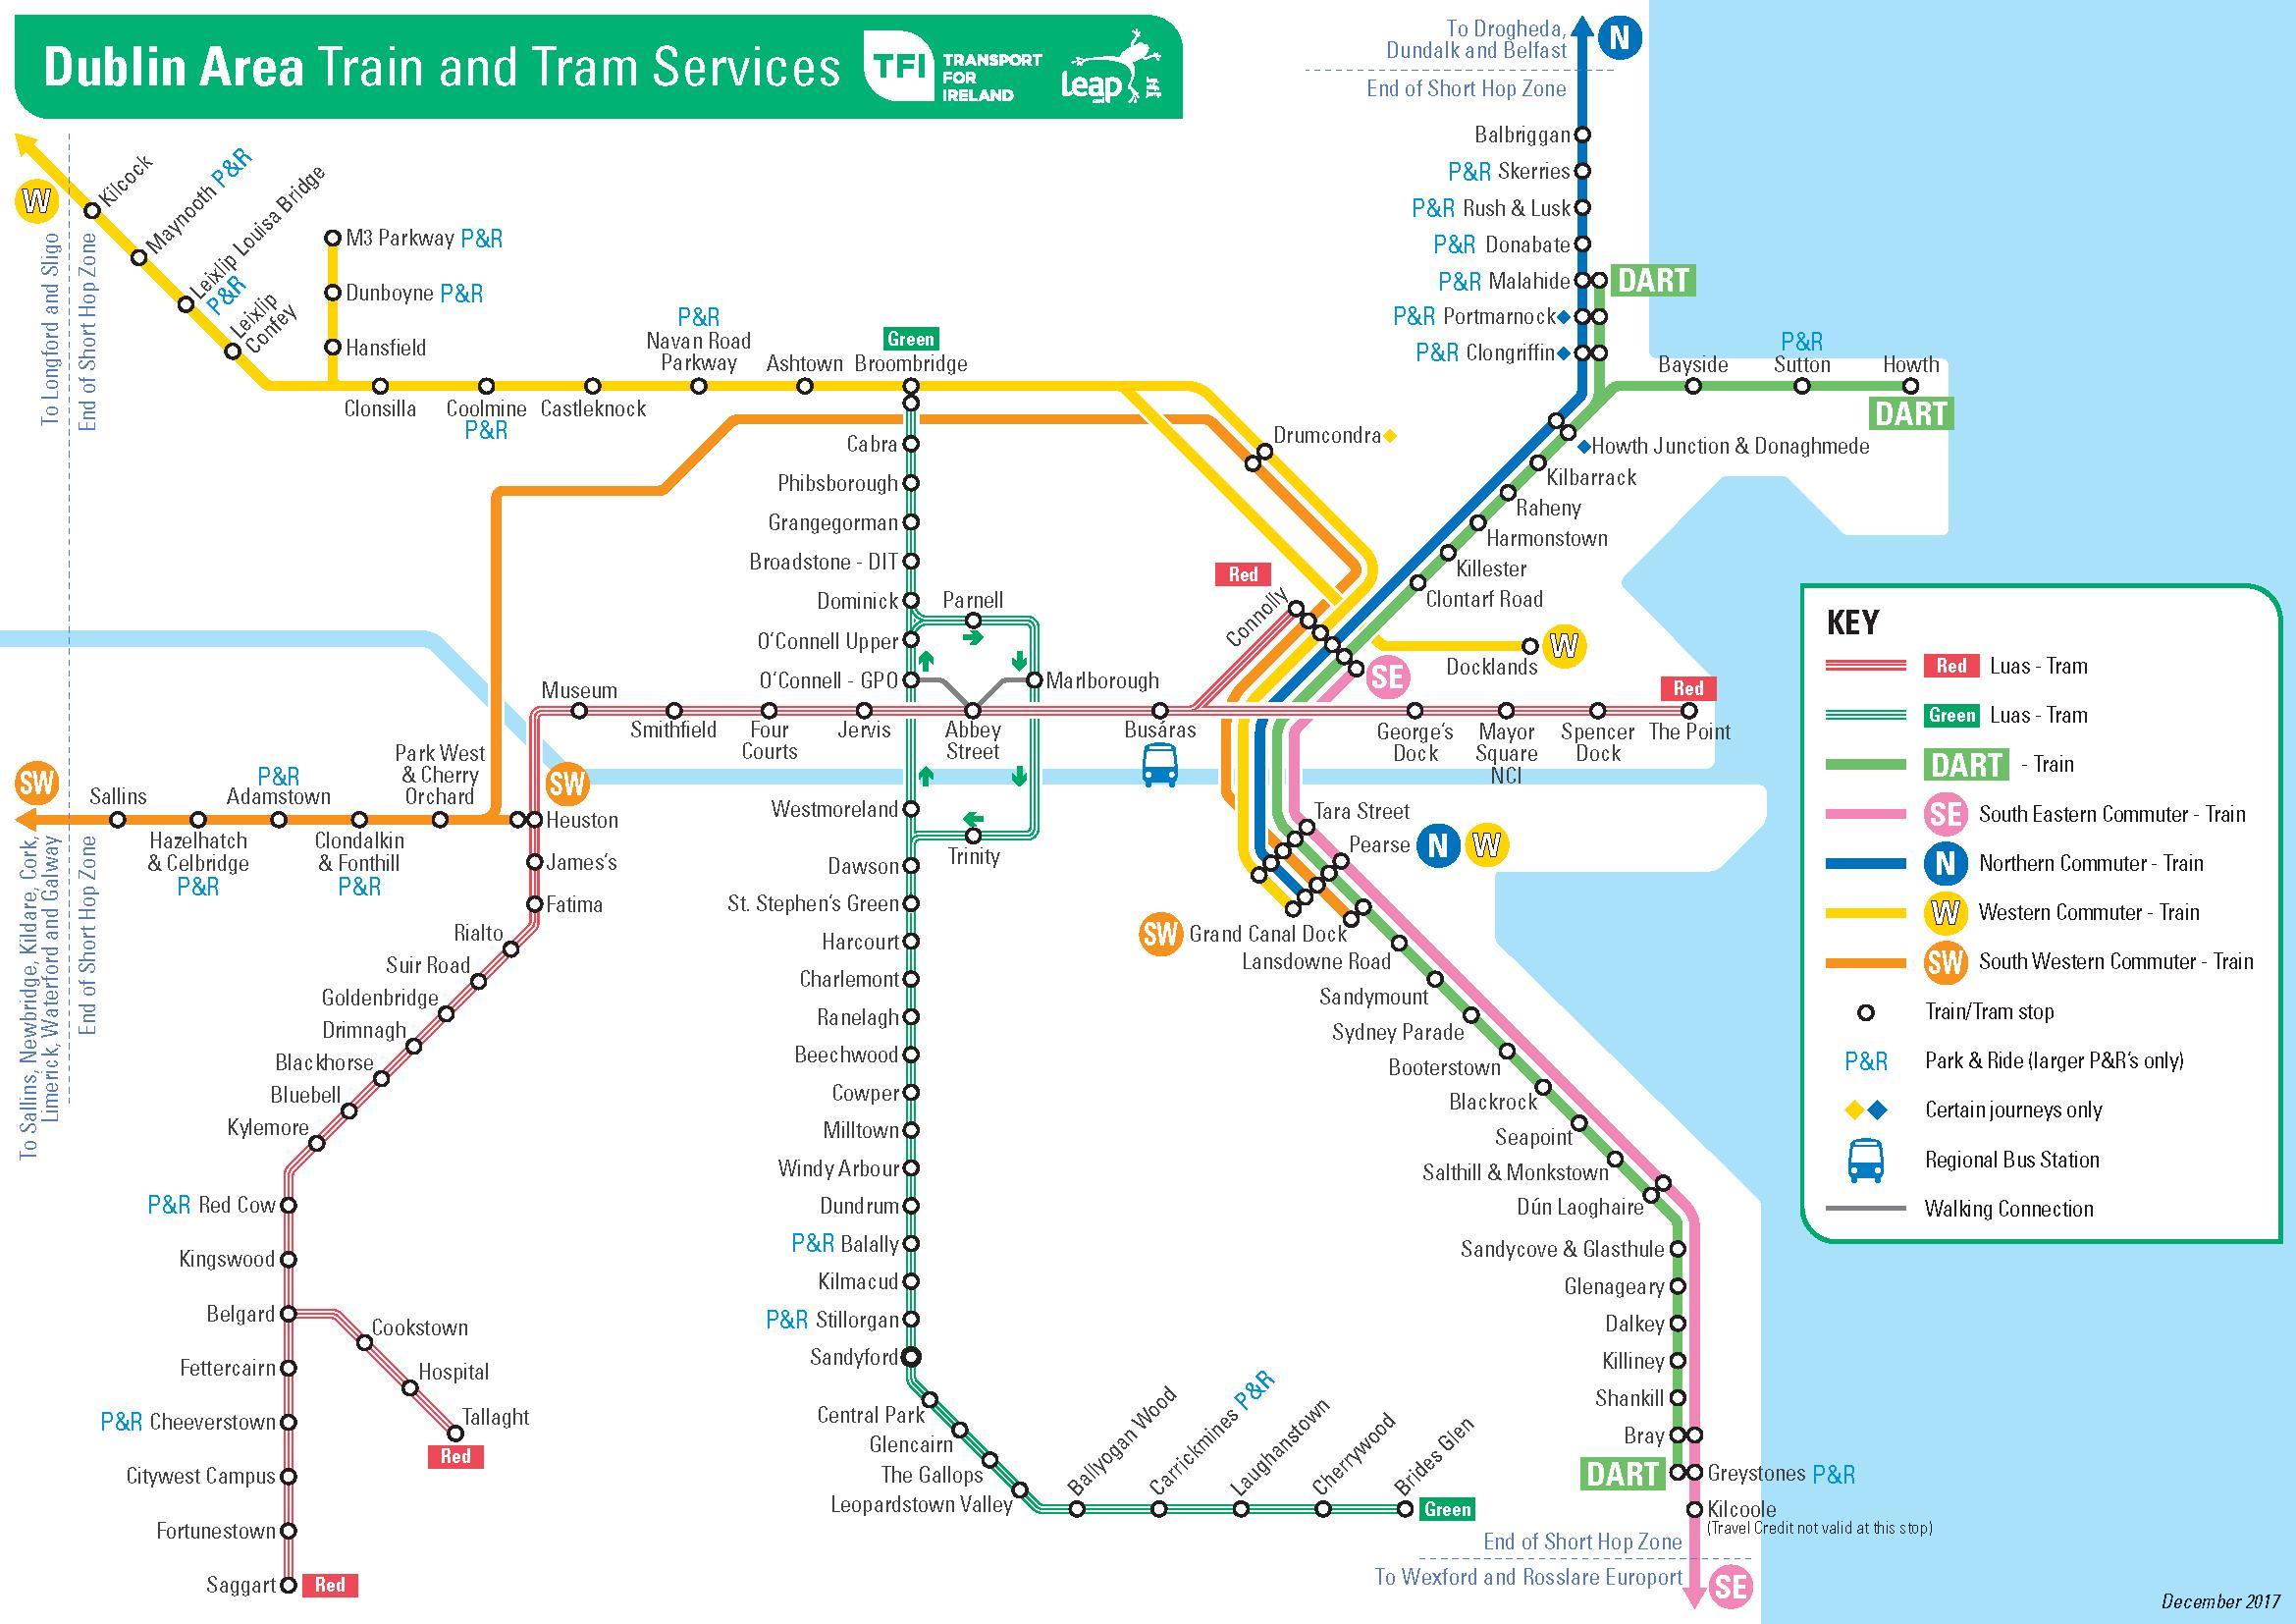 Map Of Dublin Ireland And Surrounding Area.Dart Map Dublin Map Of Dart Stations Dublin Ireland